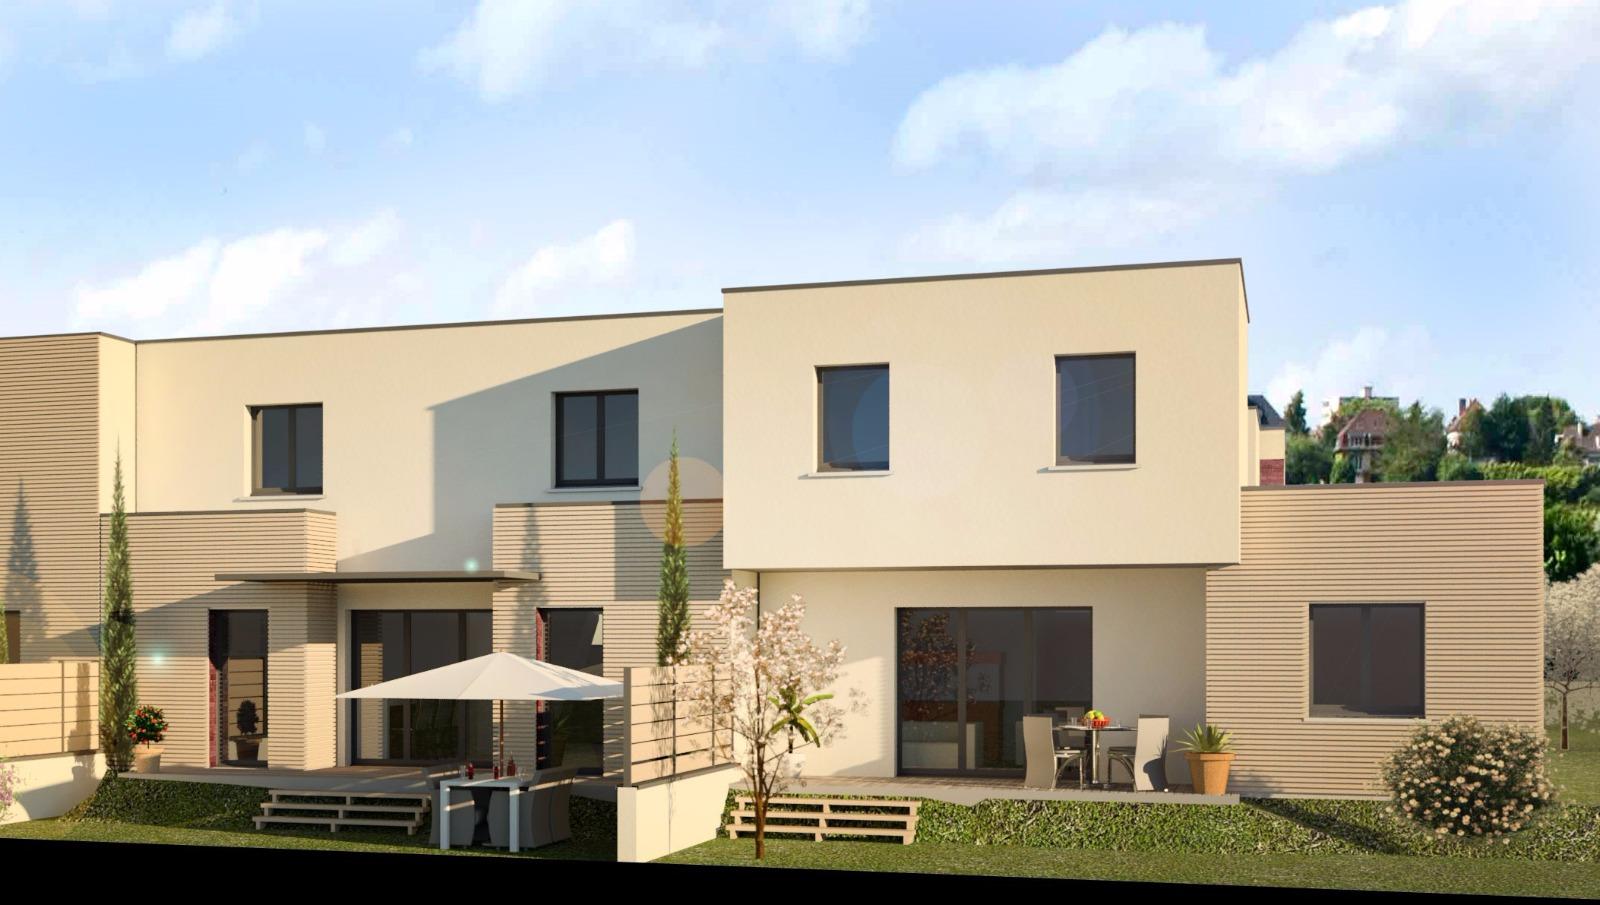 Offres programmes neufs villa duplex avec garage dans for Garage saint jean de bournay